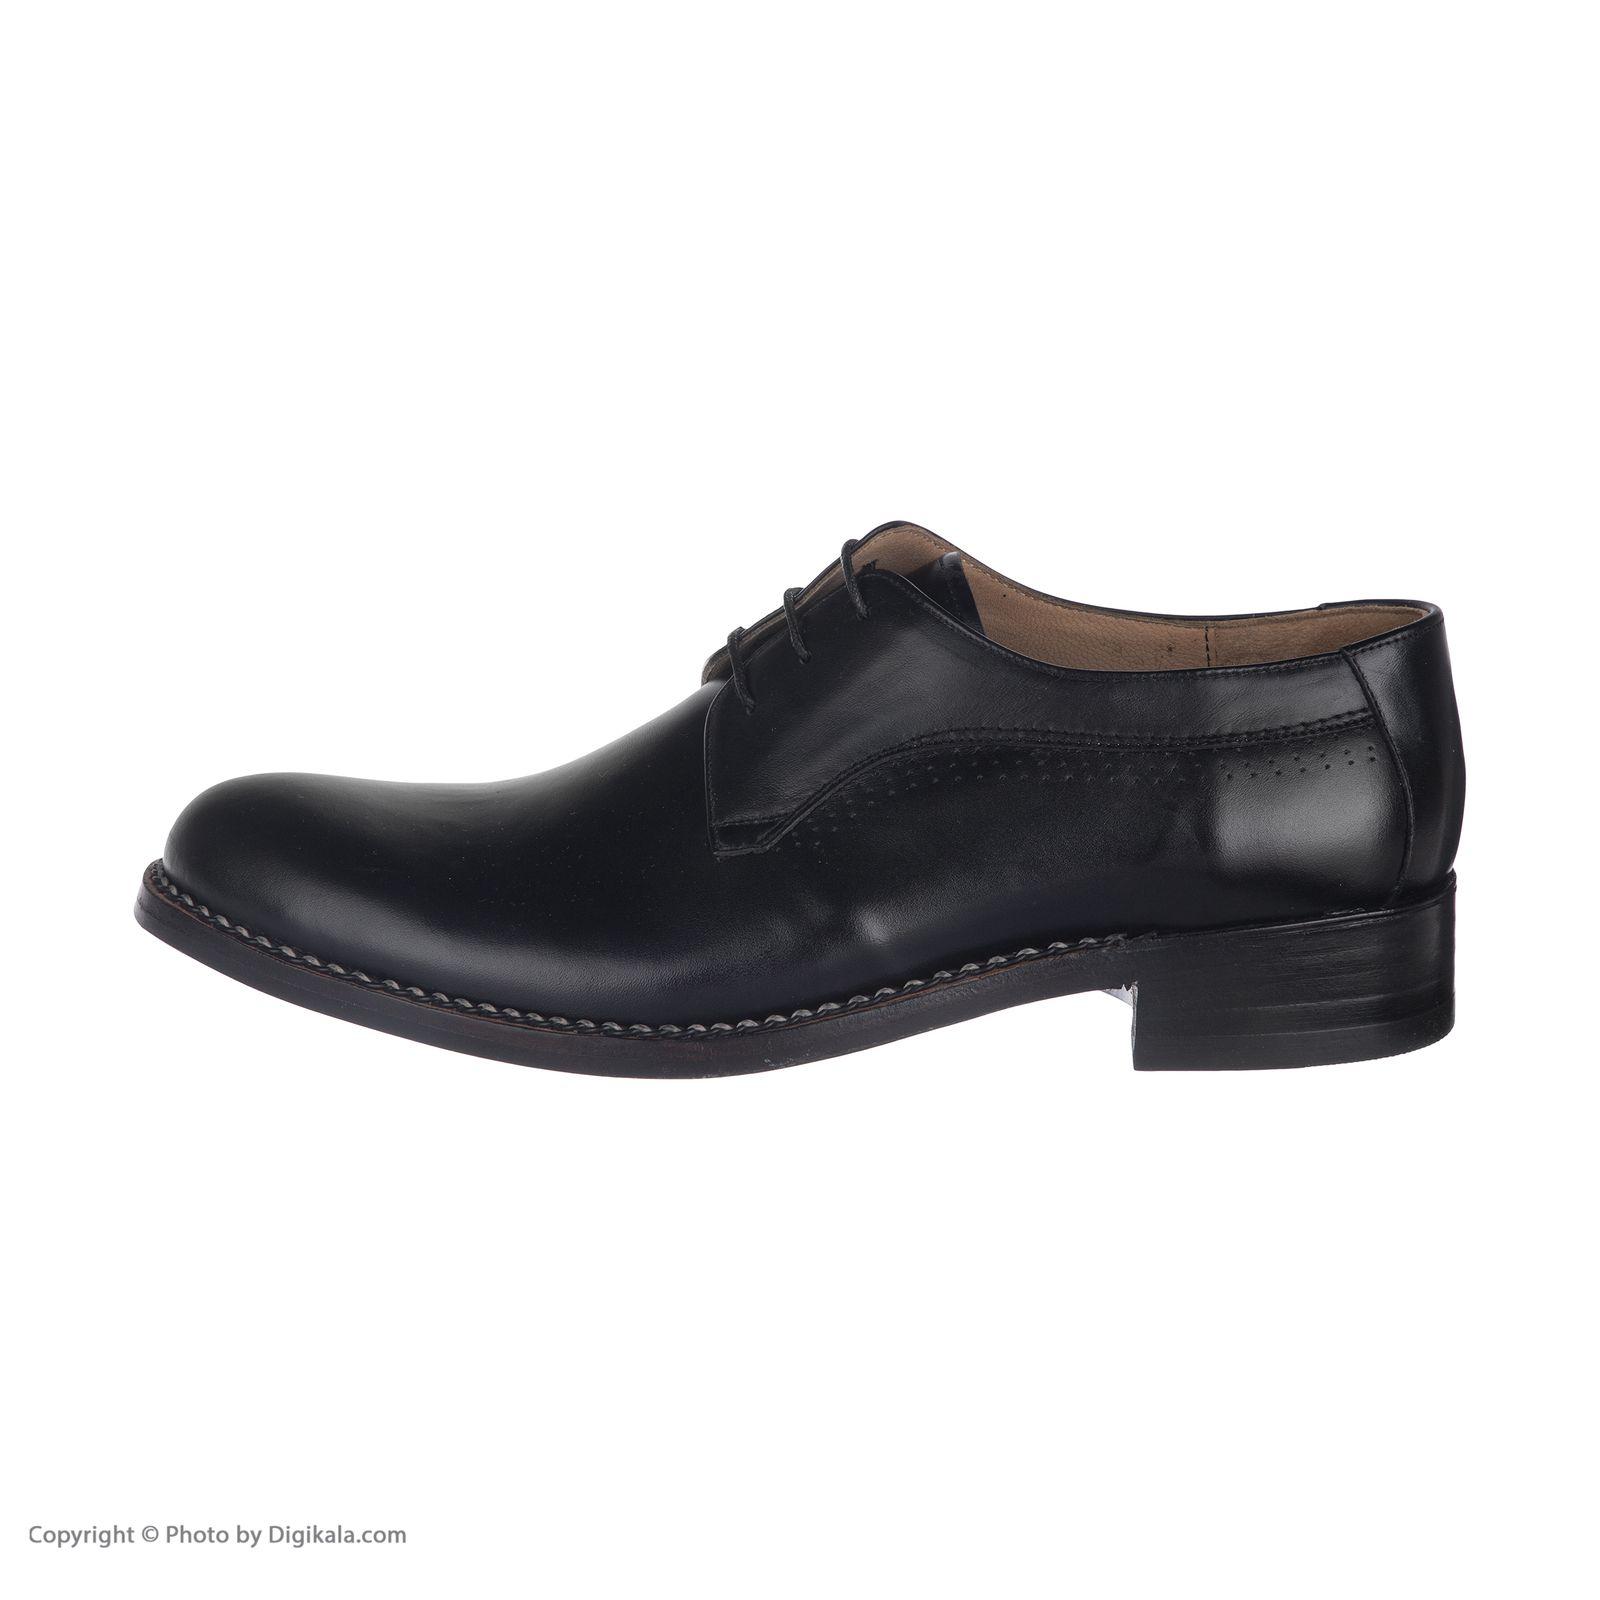 کفش مردانه نظری کد 405 -  - 1